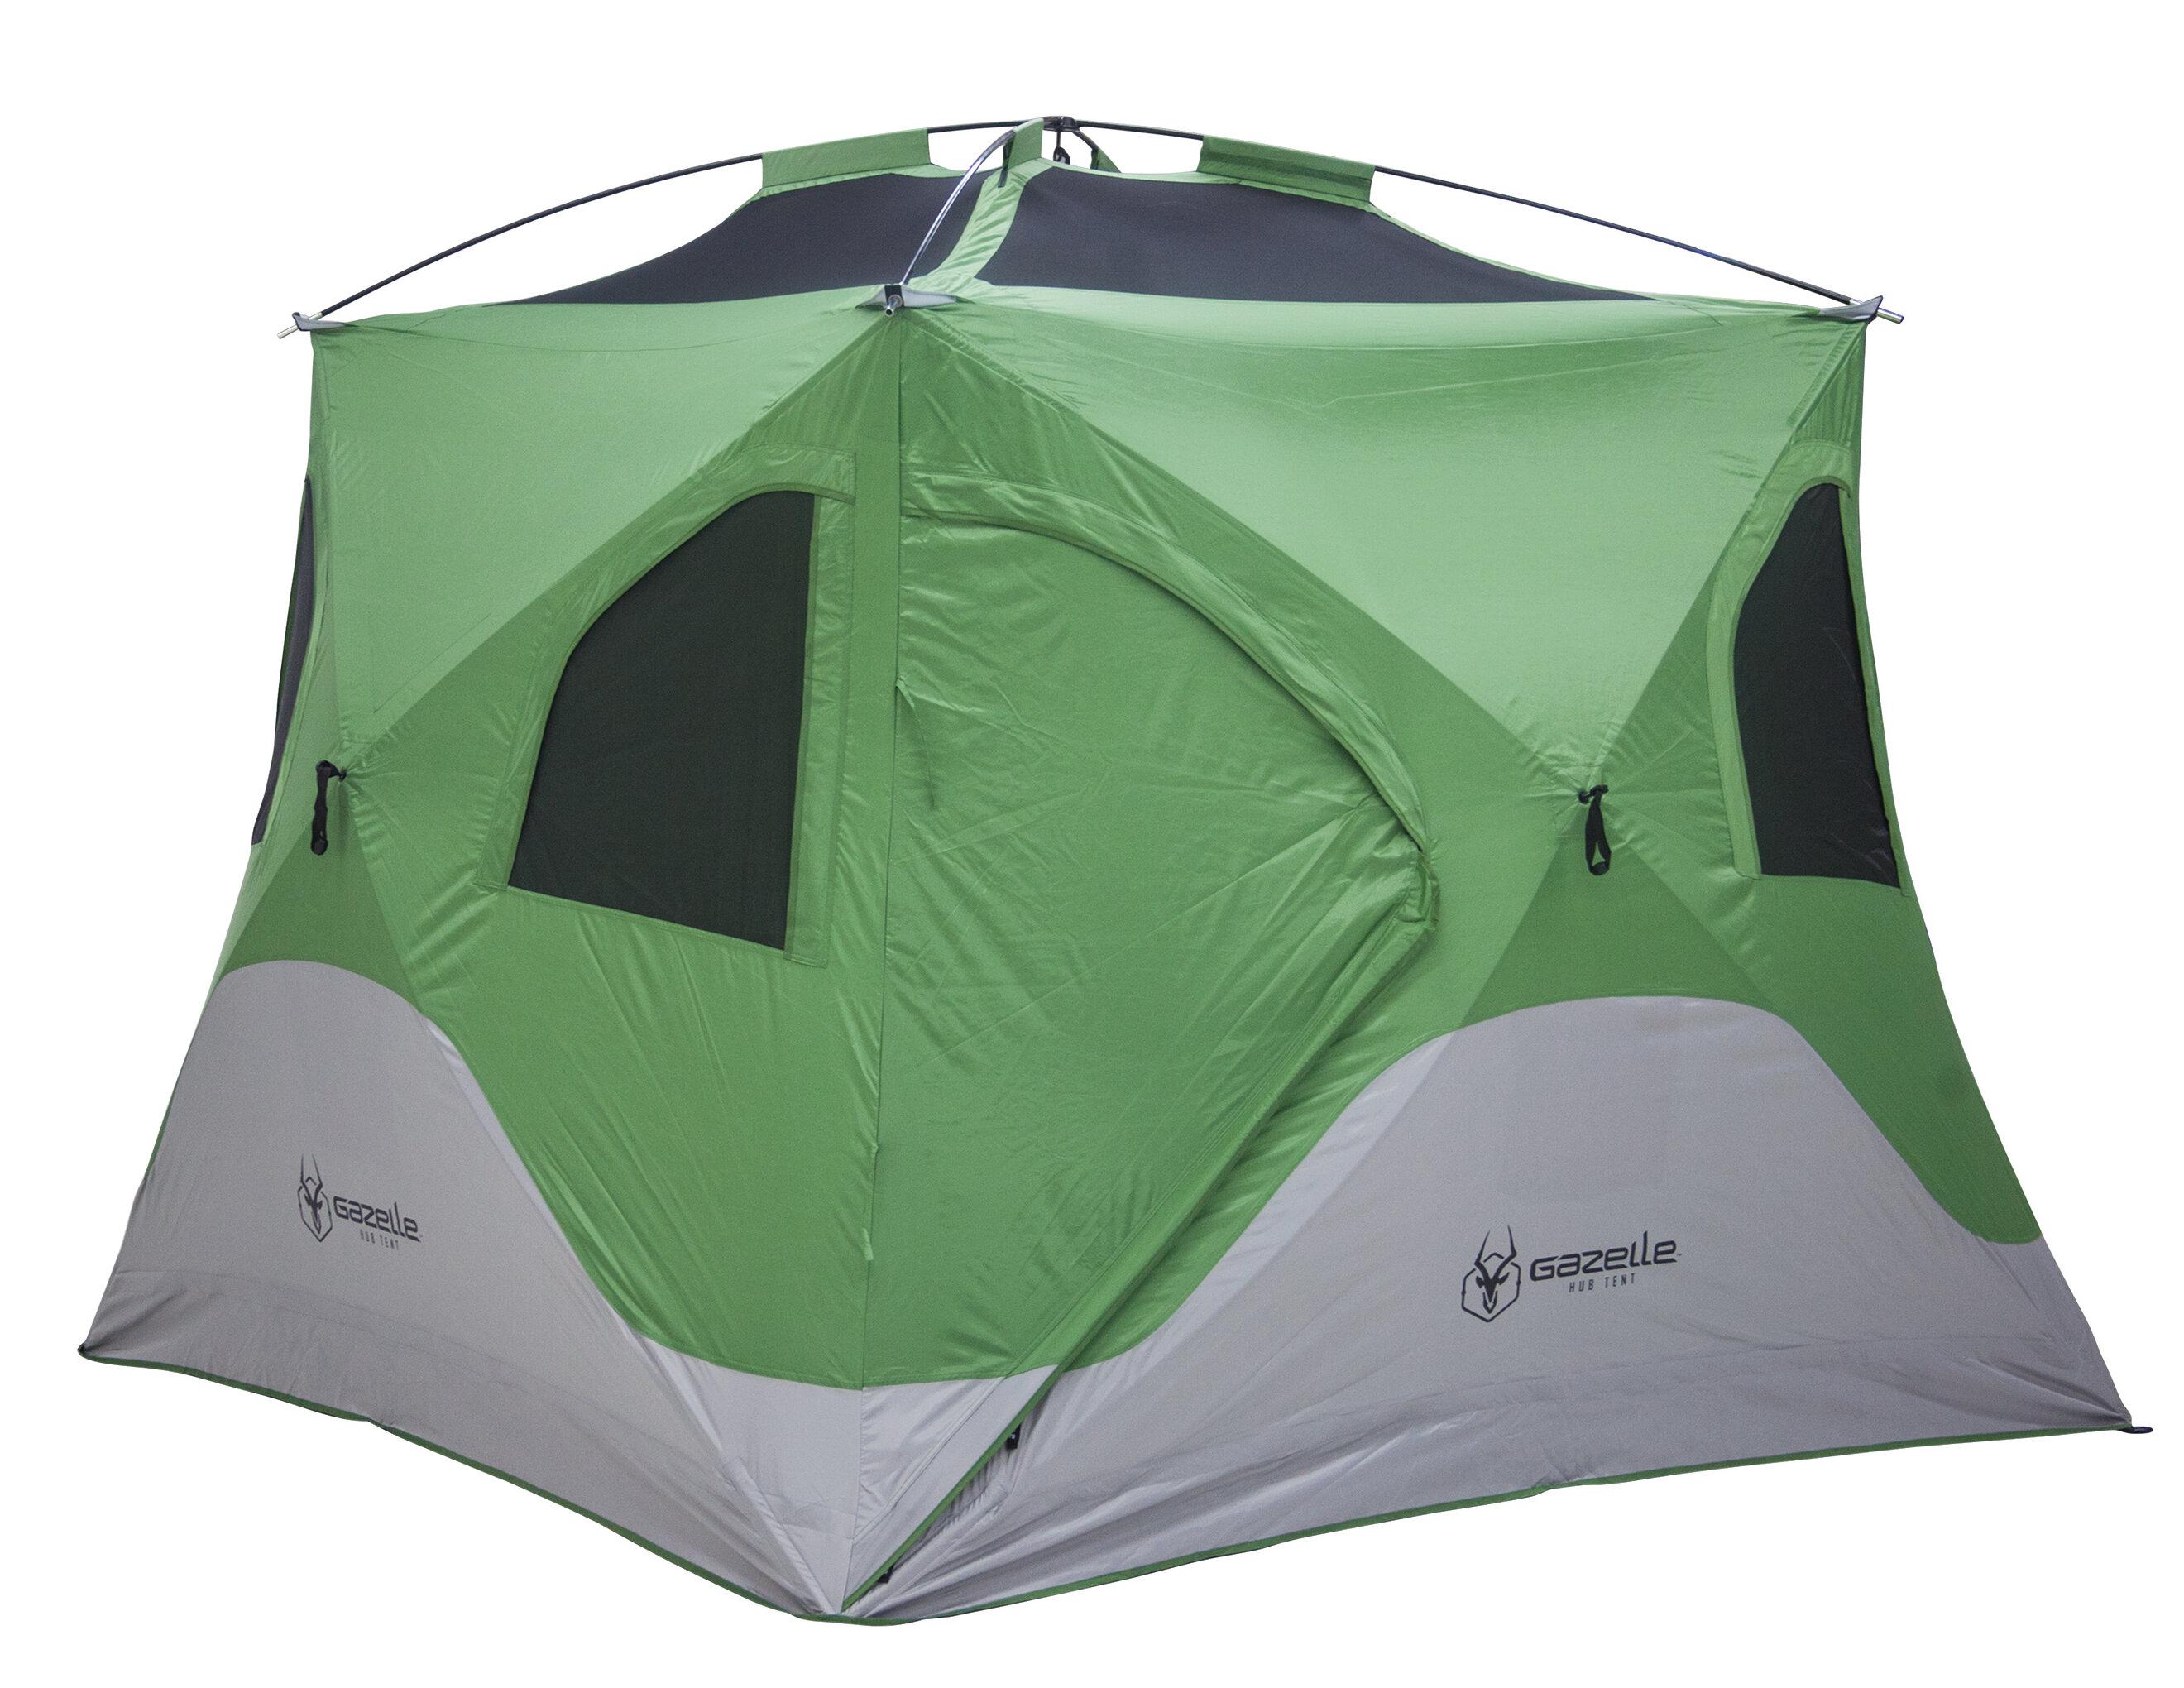 sc 1 st  Wayfair & Gazelle Pop Up Portable Camping Hub 4 Person Tent   Wayfair